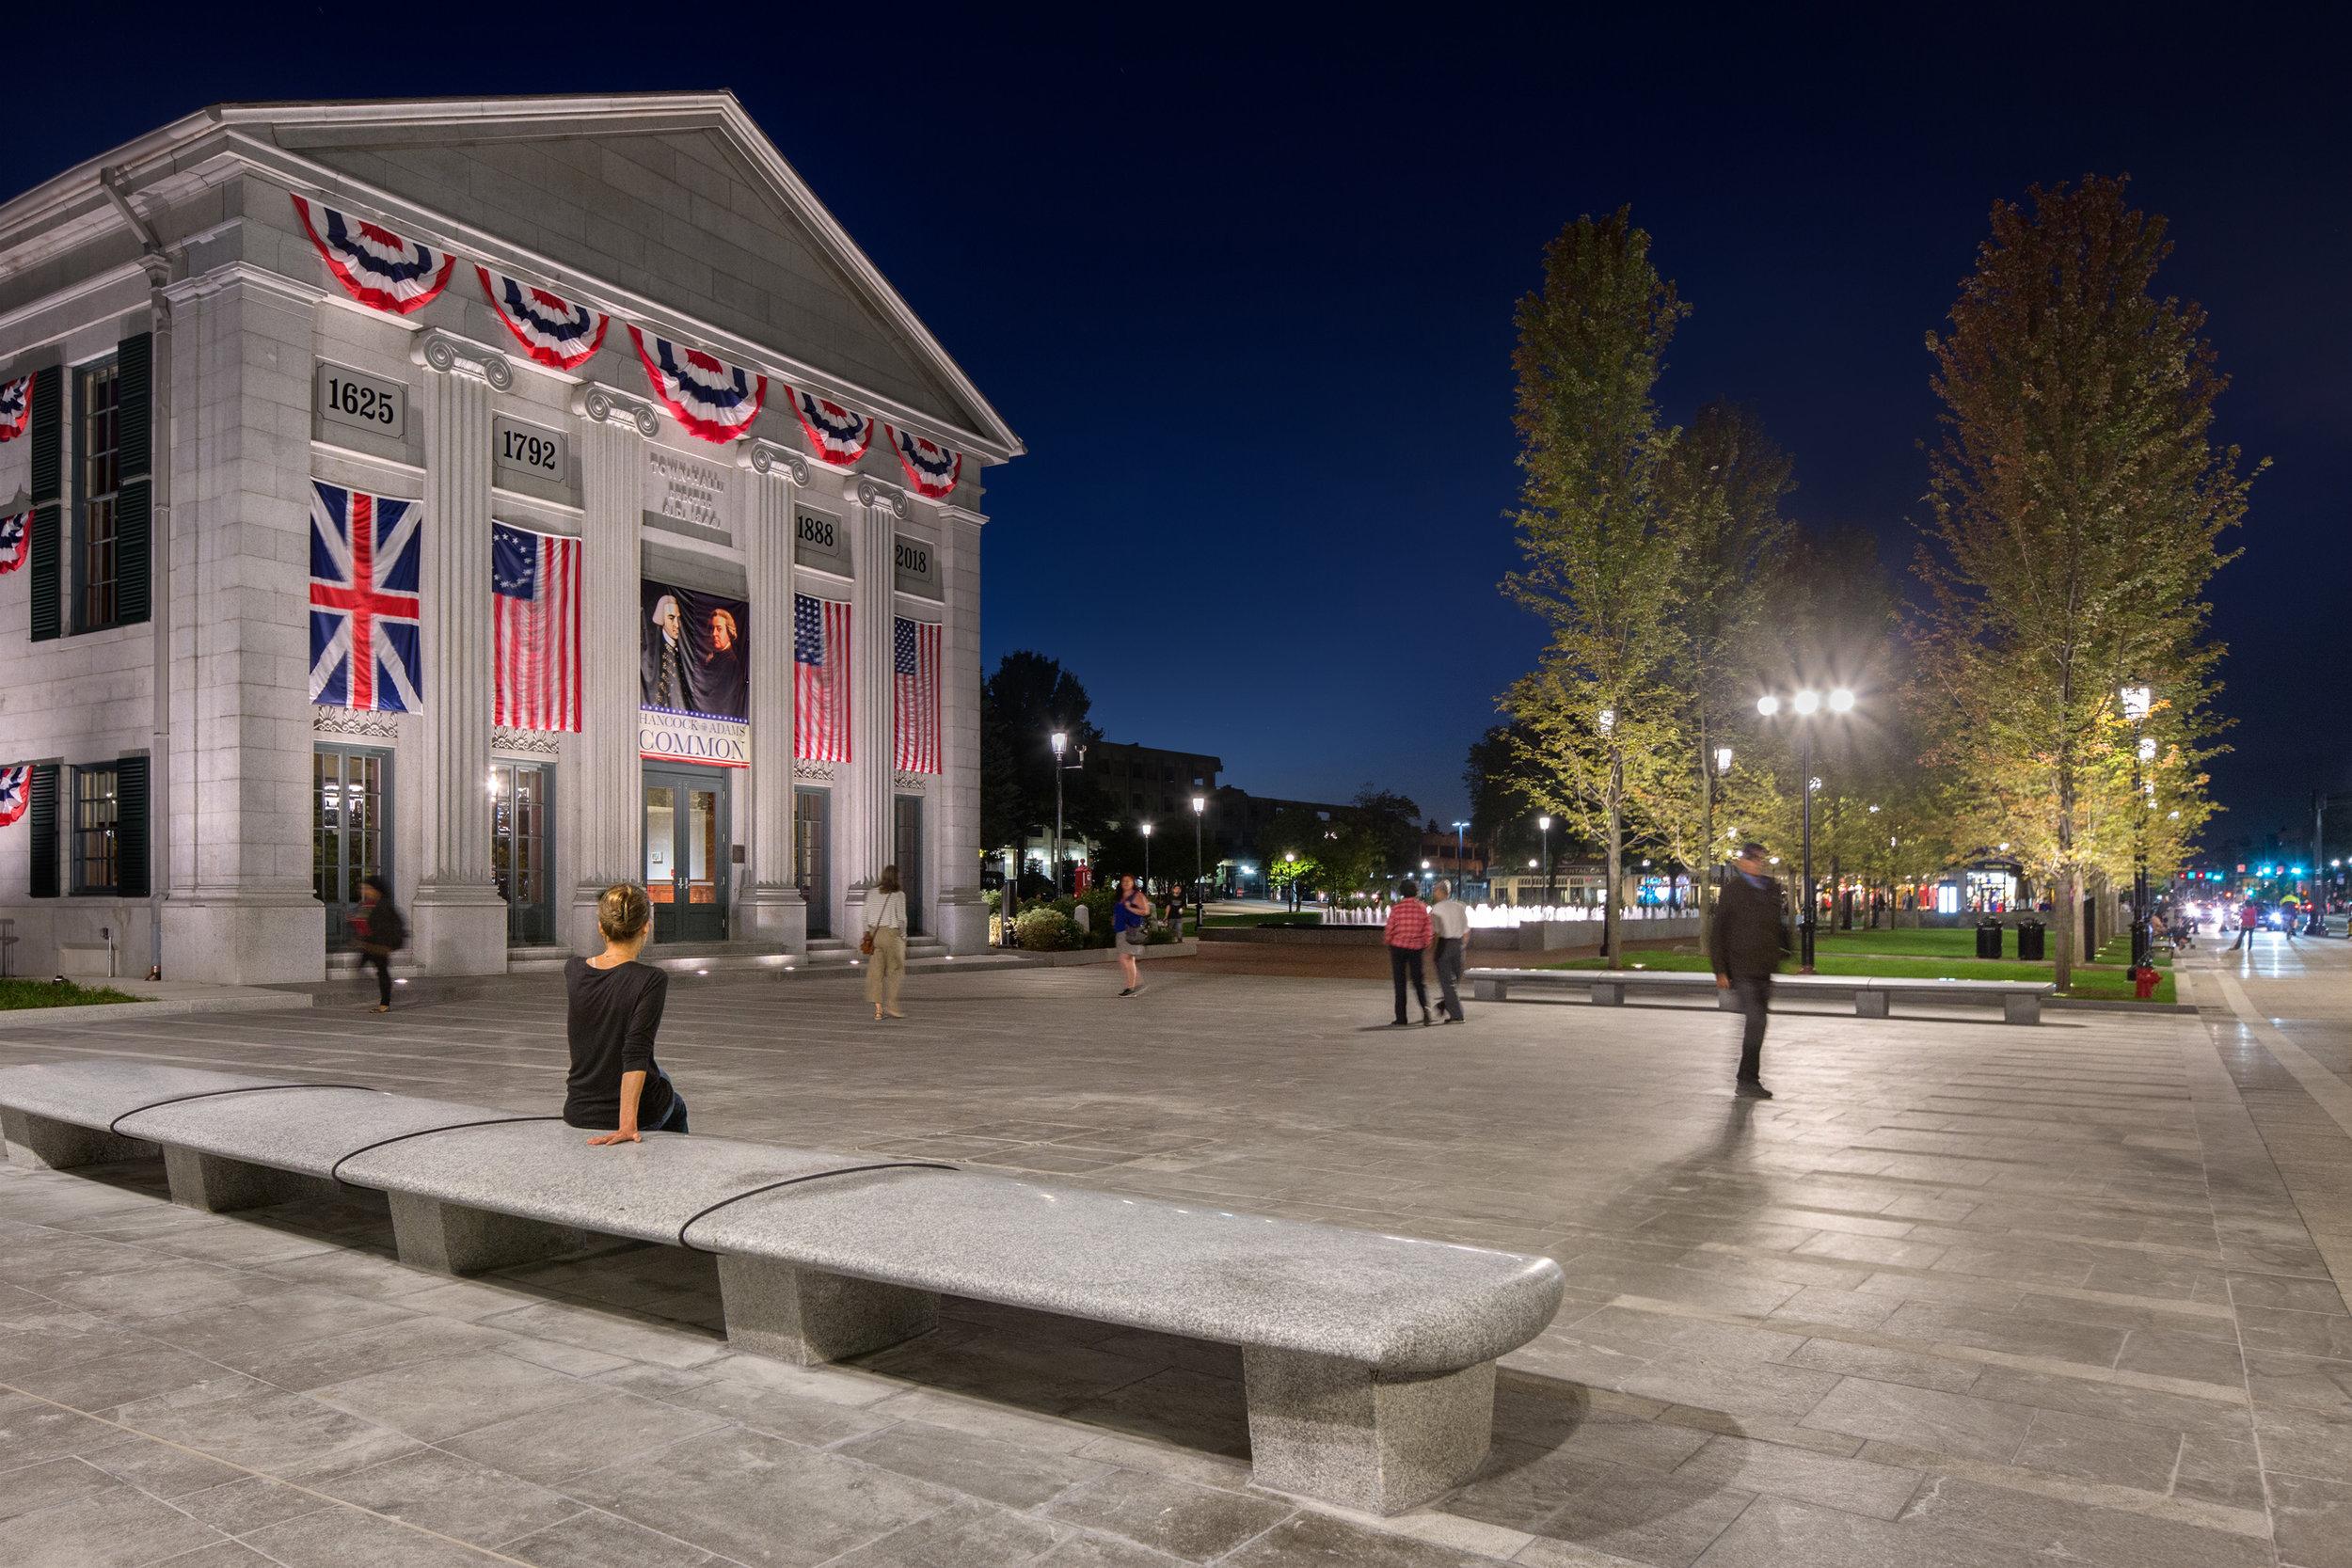 Evening view of Hancock Adams Common plaza (Photographer: Ed Wonsek)